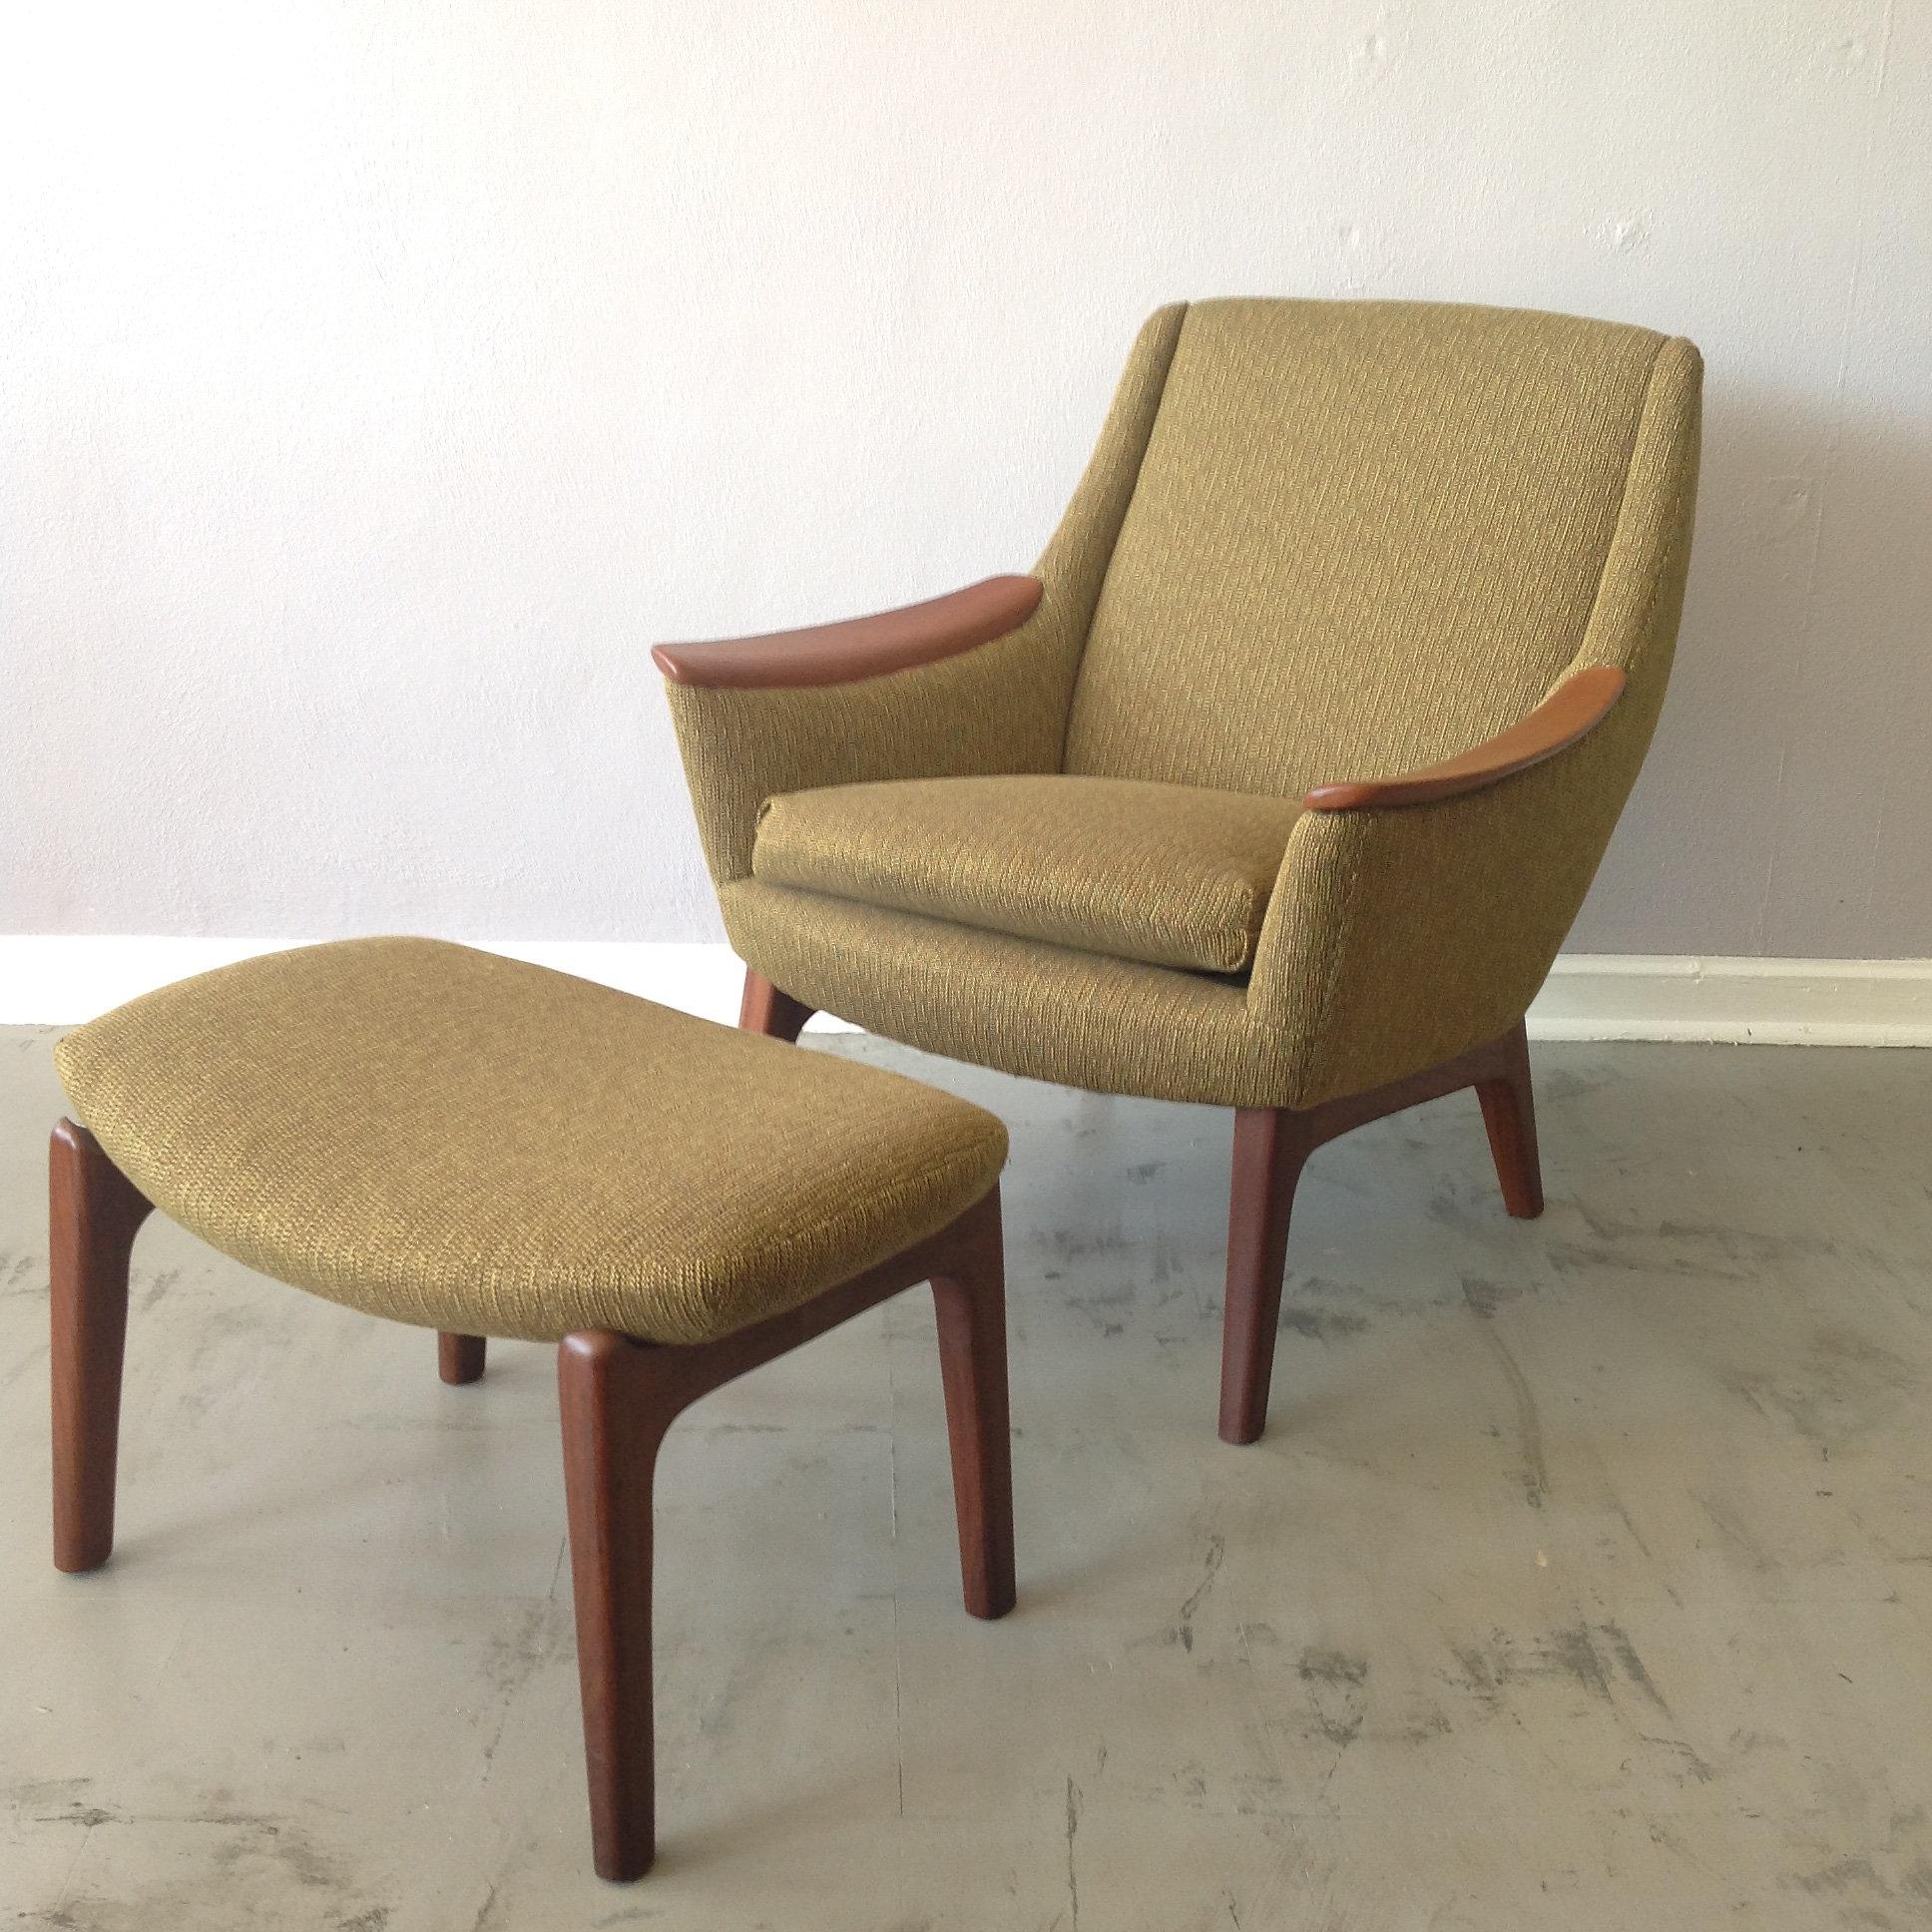 Mid Century Modern Furniture St Louis Missouri Confluence. Modern Furniture St Louis Mo   penncoremedia com